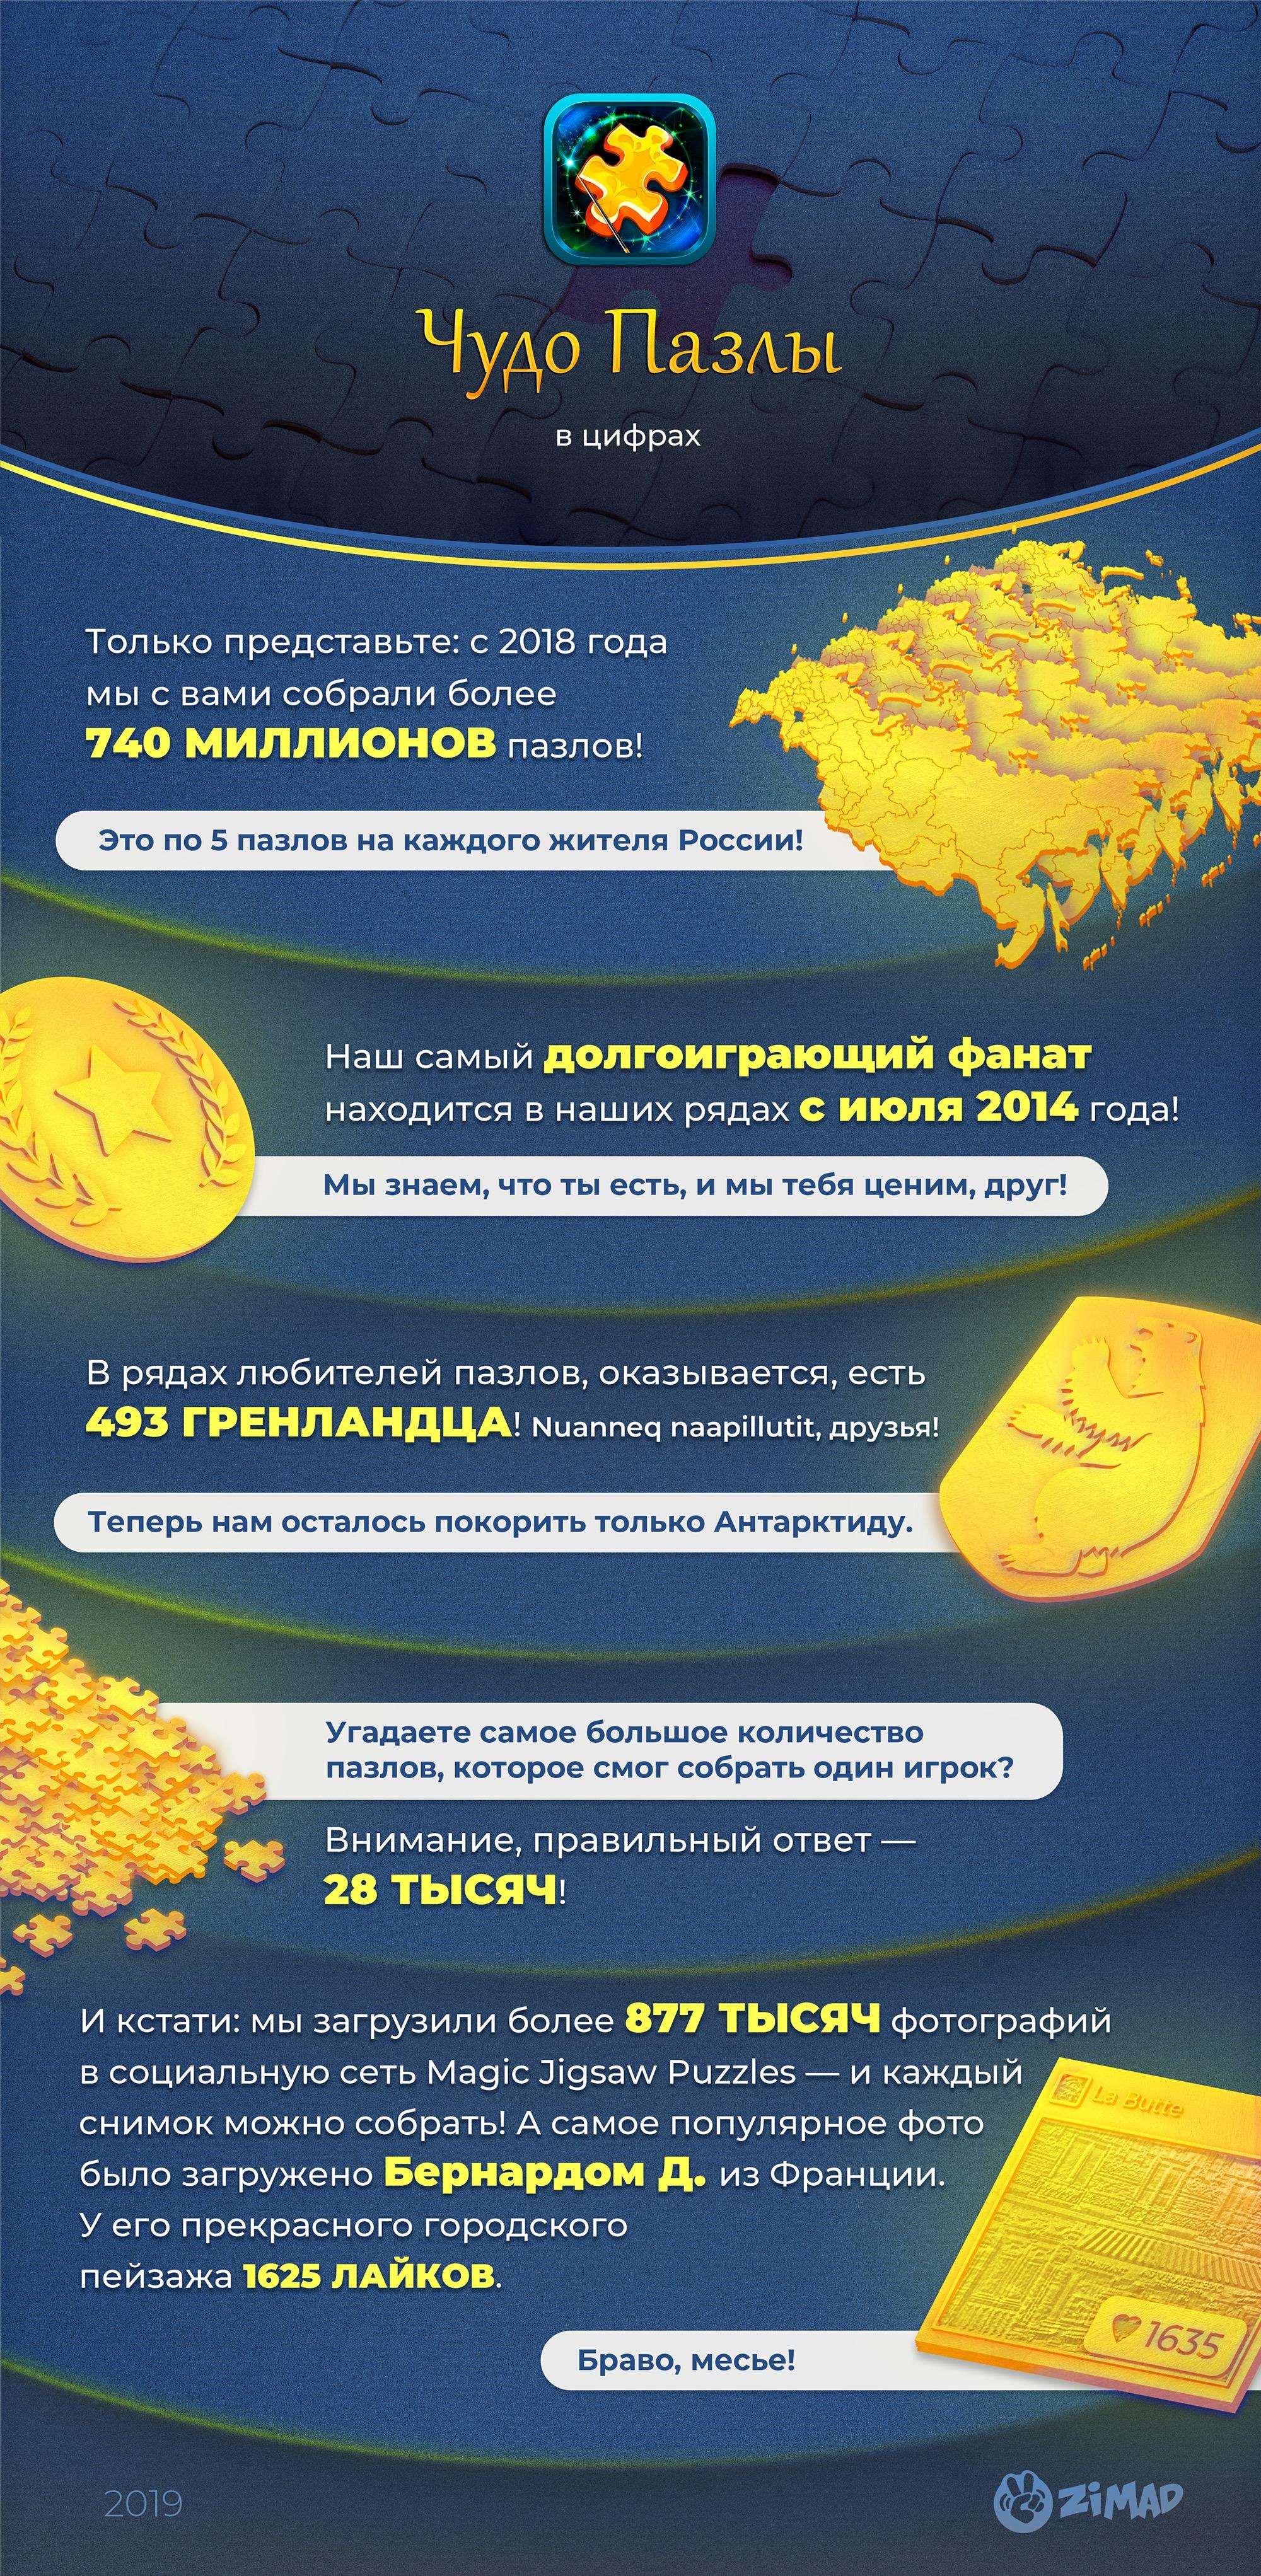 Magic Jigsaw Puzzles инфографика